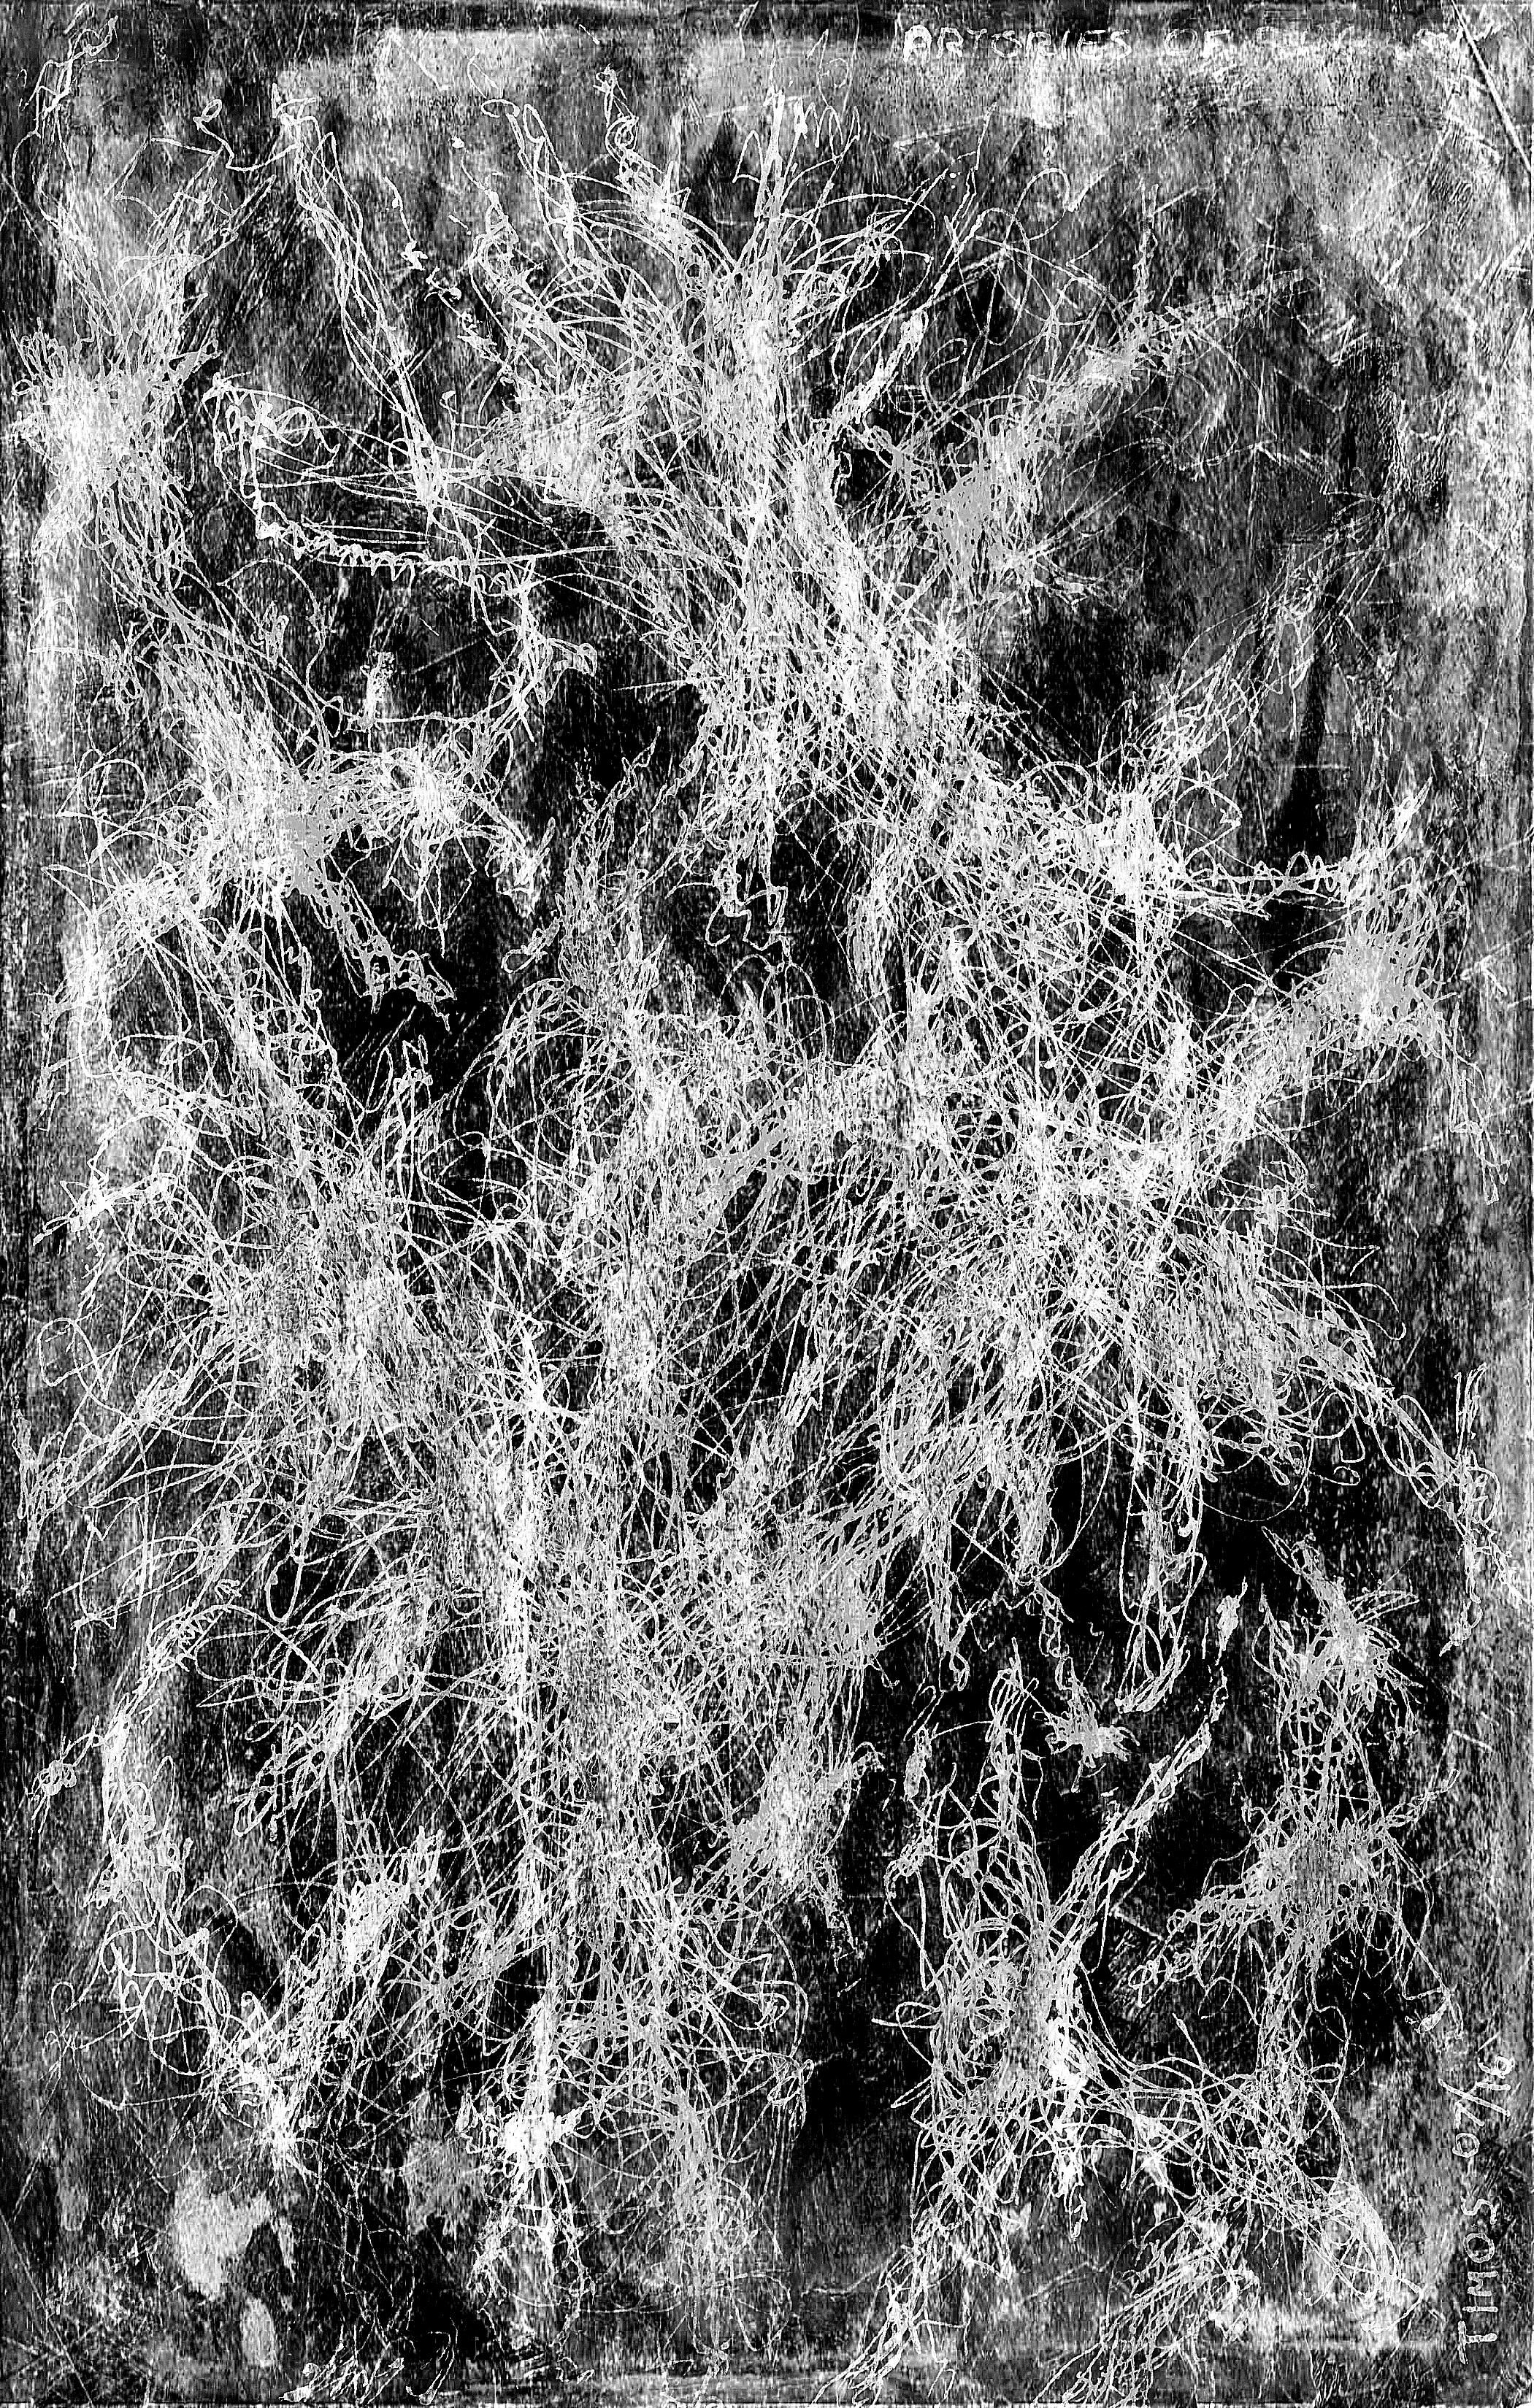 Arteries of anguish